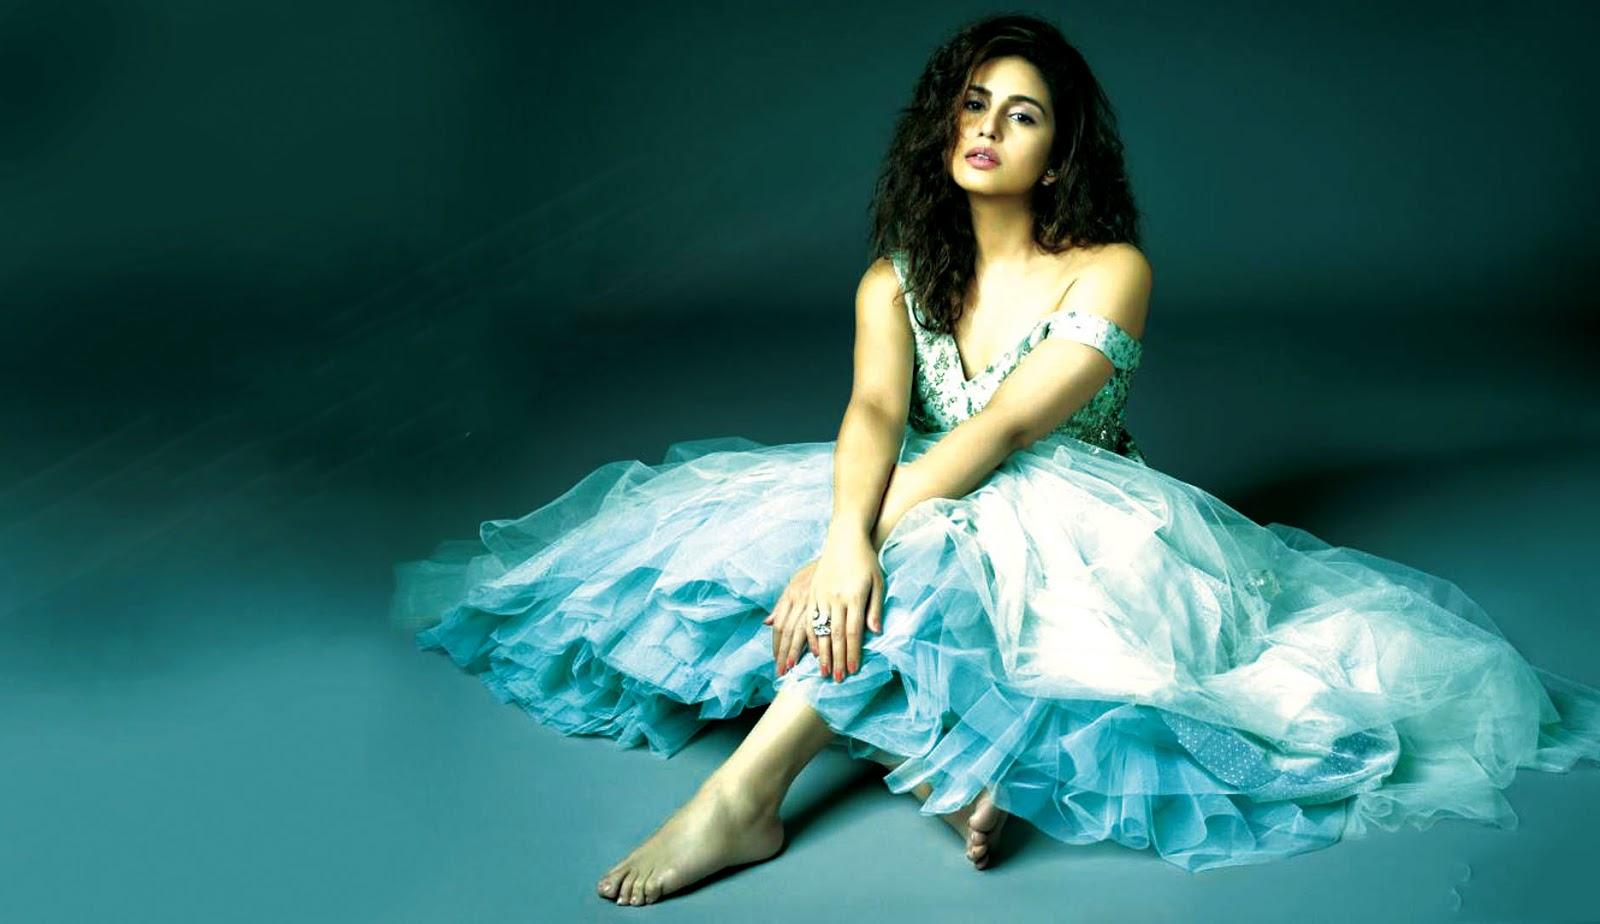 Download Bollywood Actress Hd Wallpapers 1080p Free: Huma Qureshi Wallpapers HD Download Free 1080p